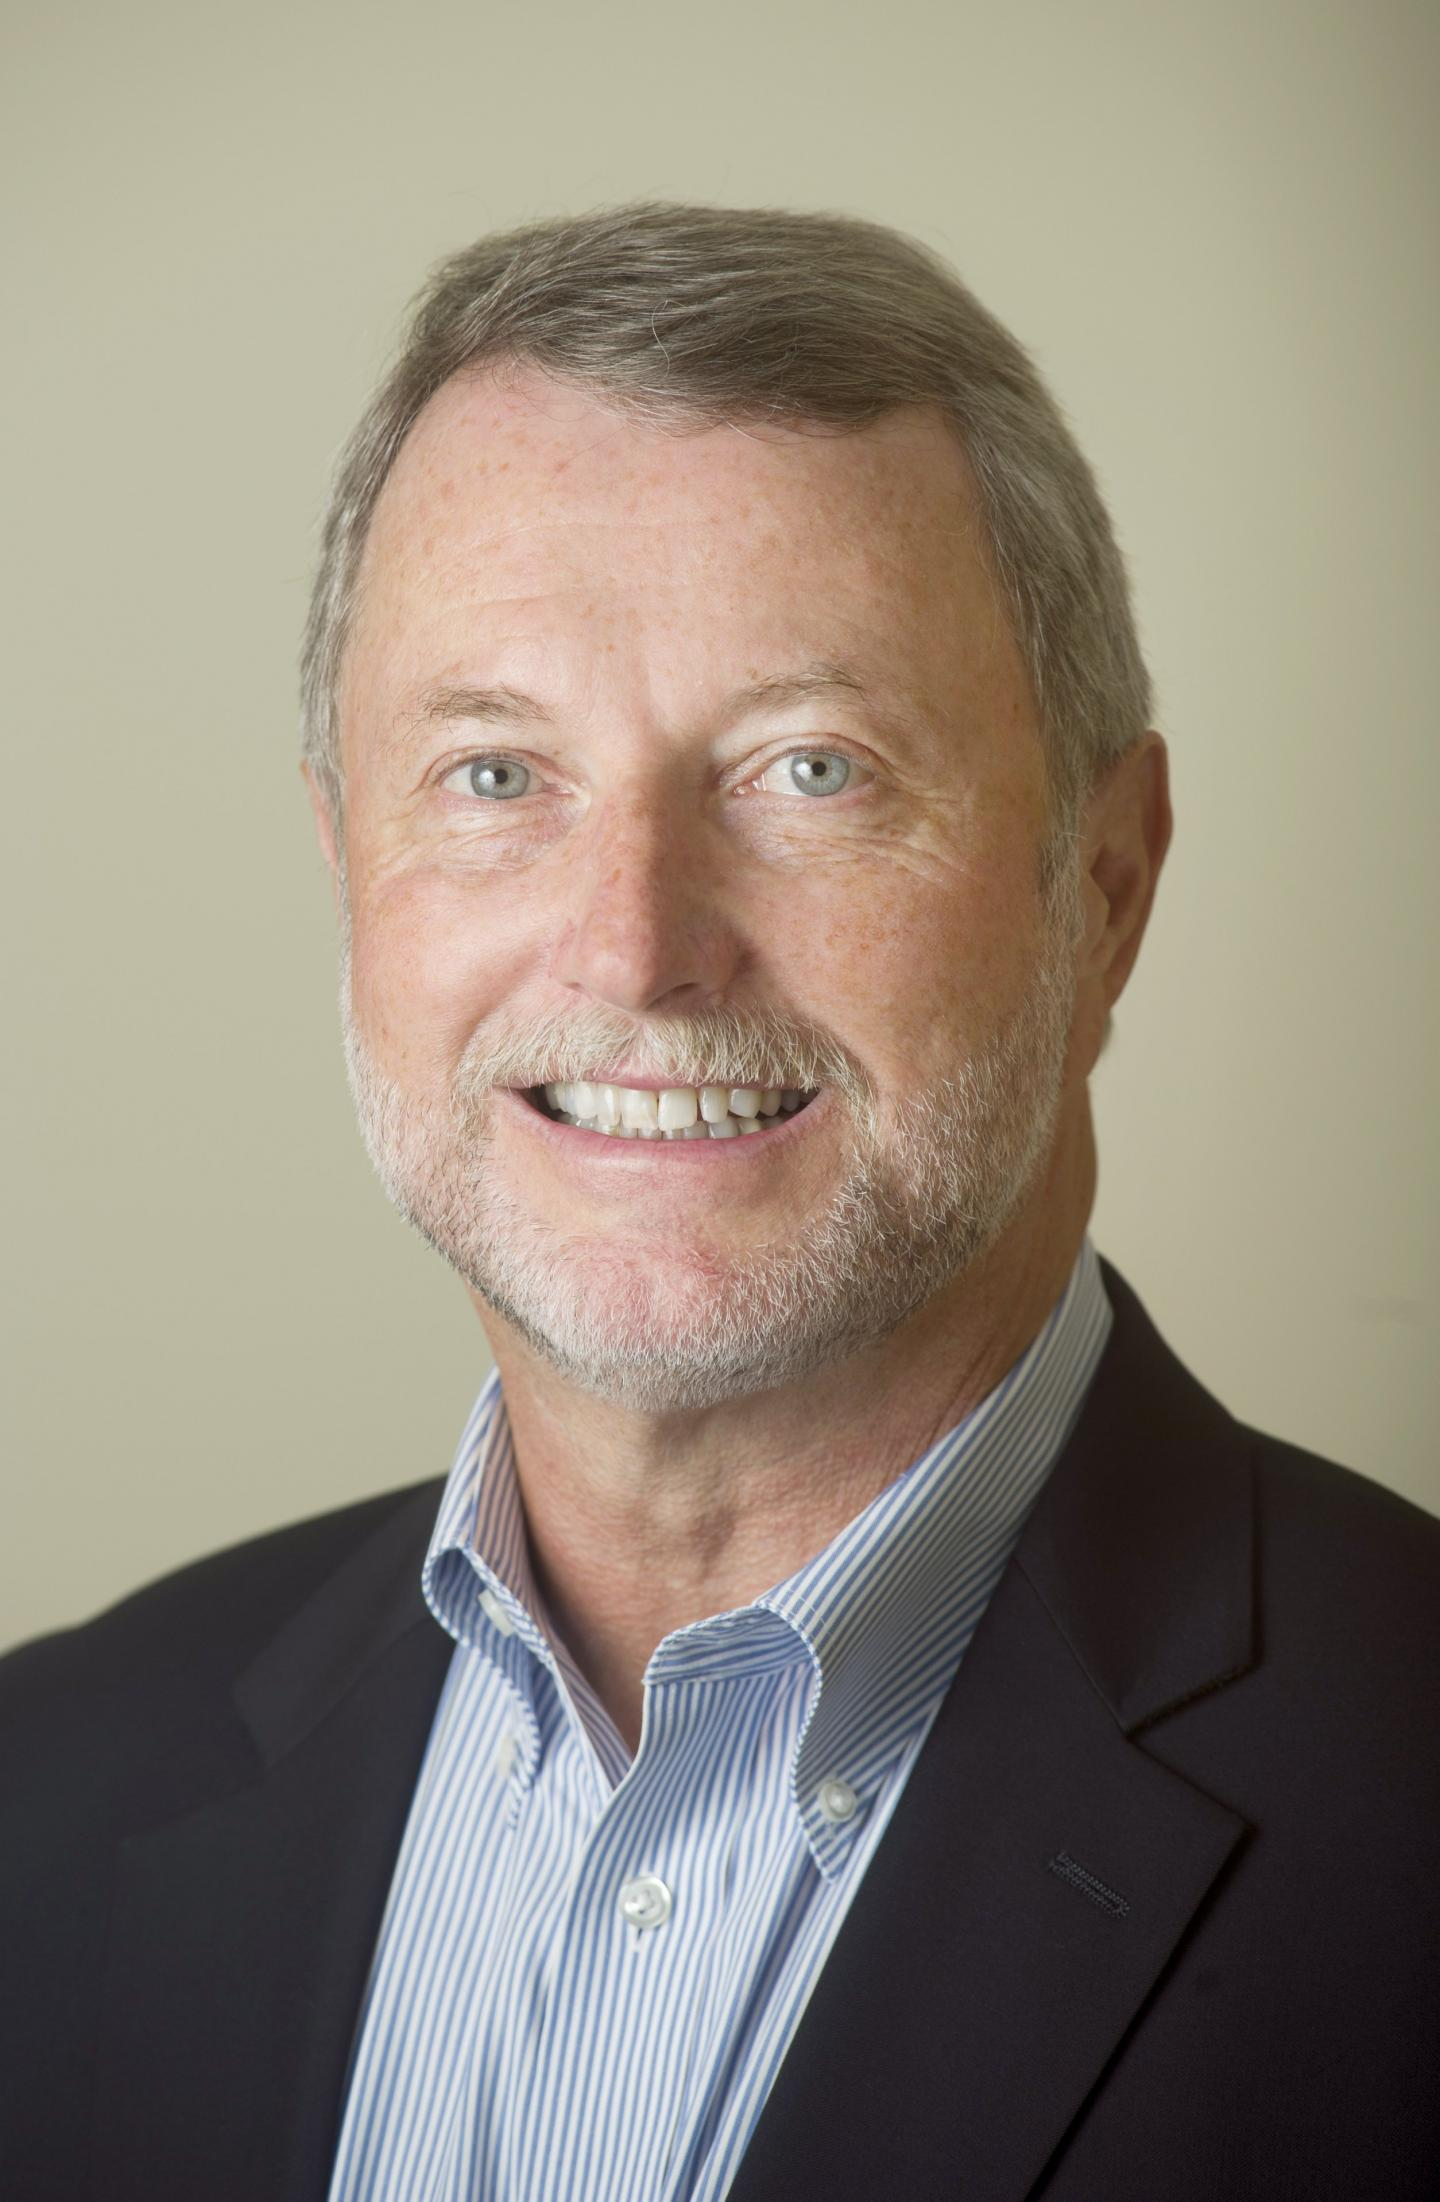 David Amaral, University of California - Davis Health System